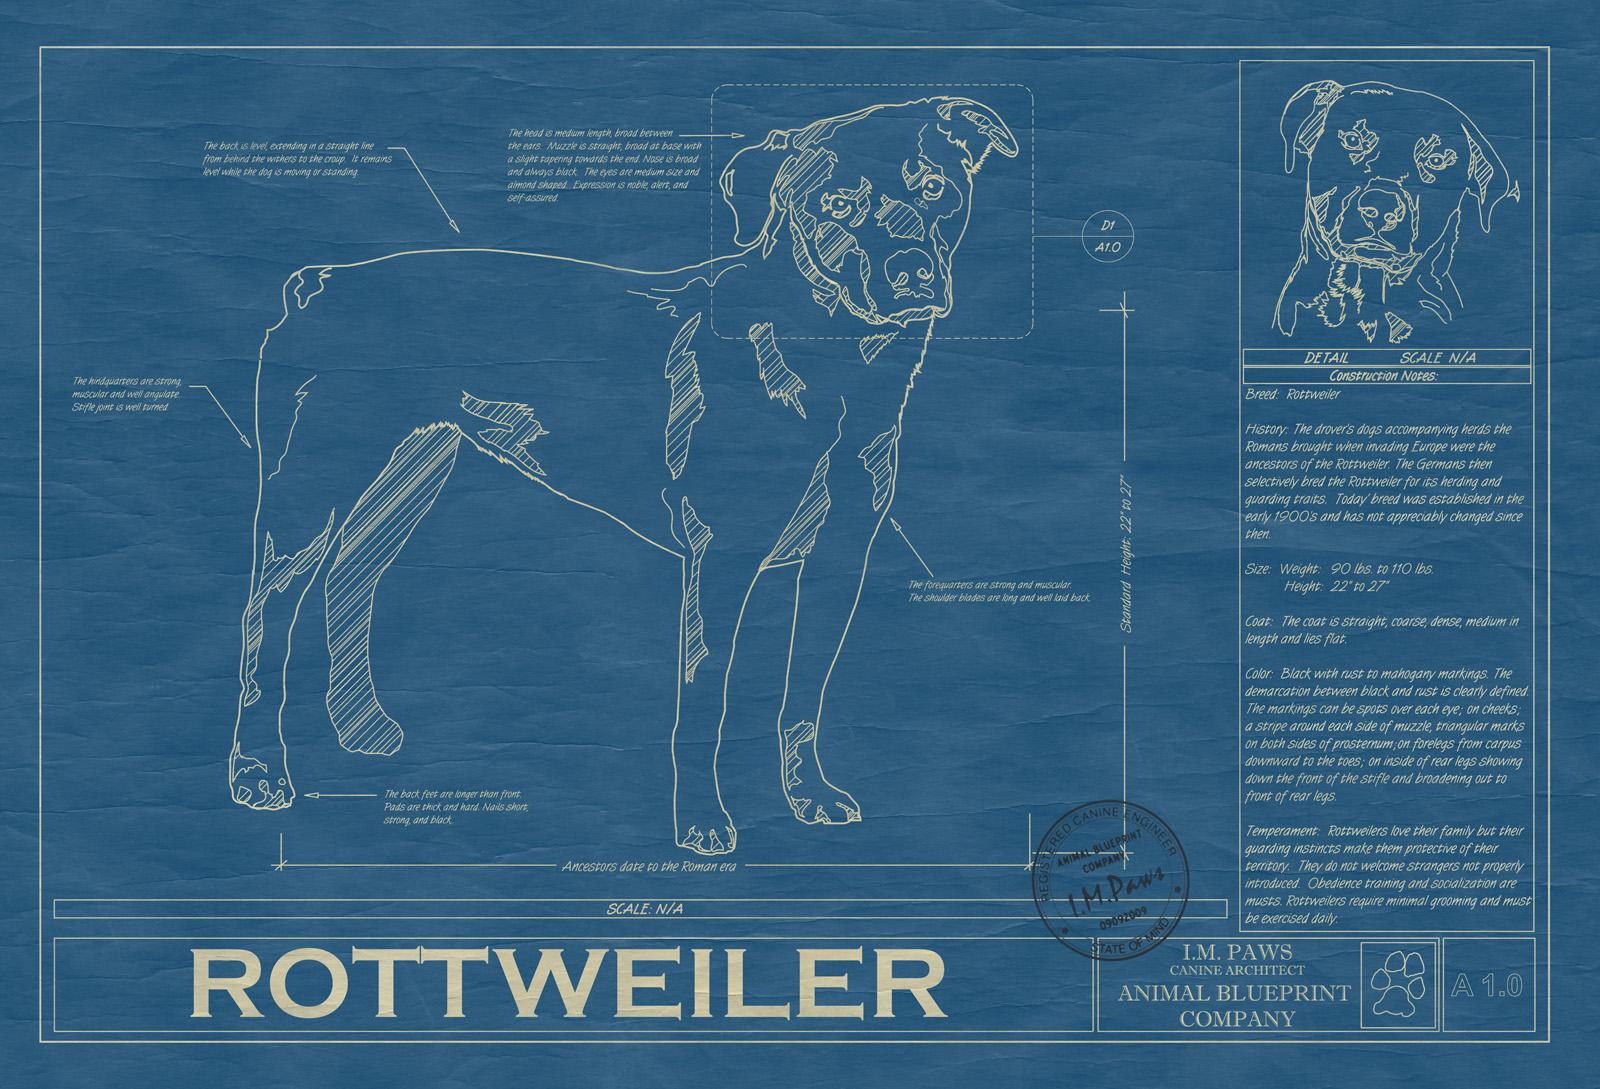 Rottweiler animal blueprint company rottweiler dog blueprint malvernweather Images